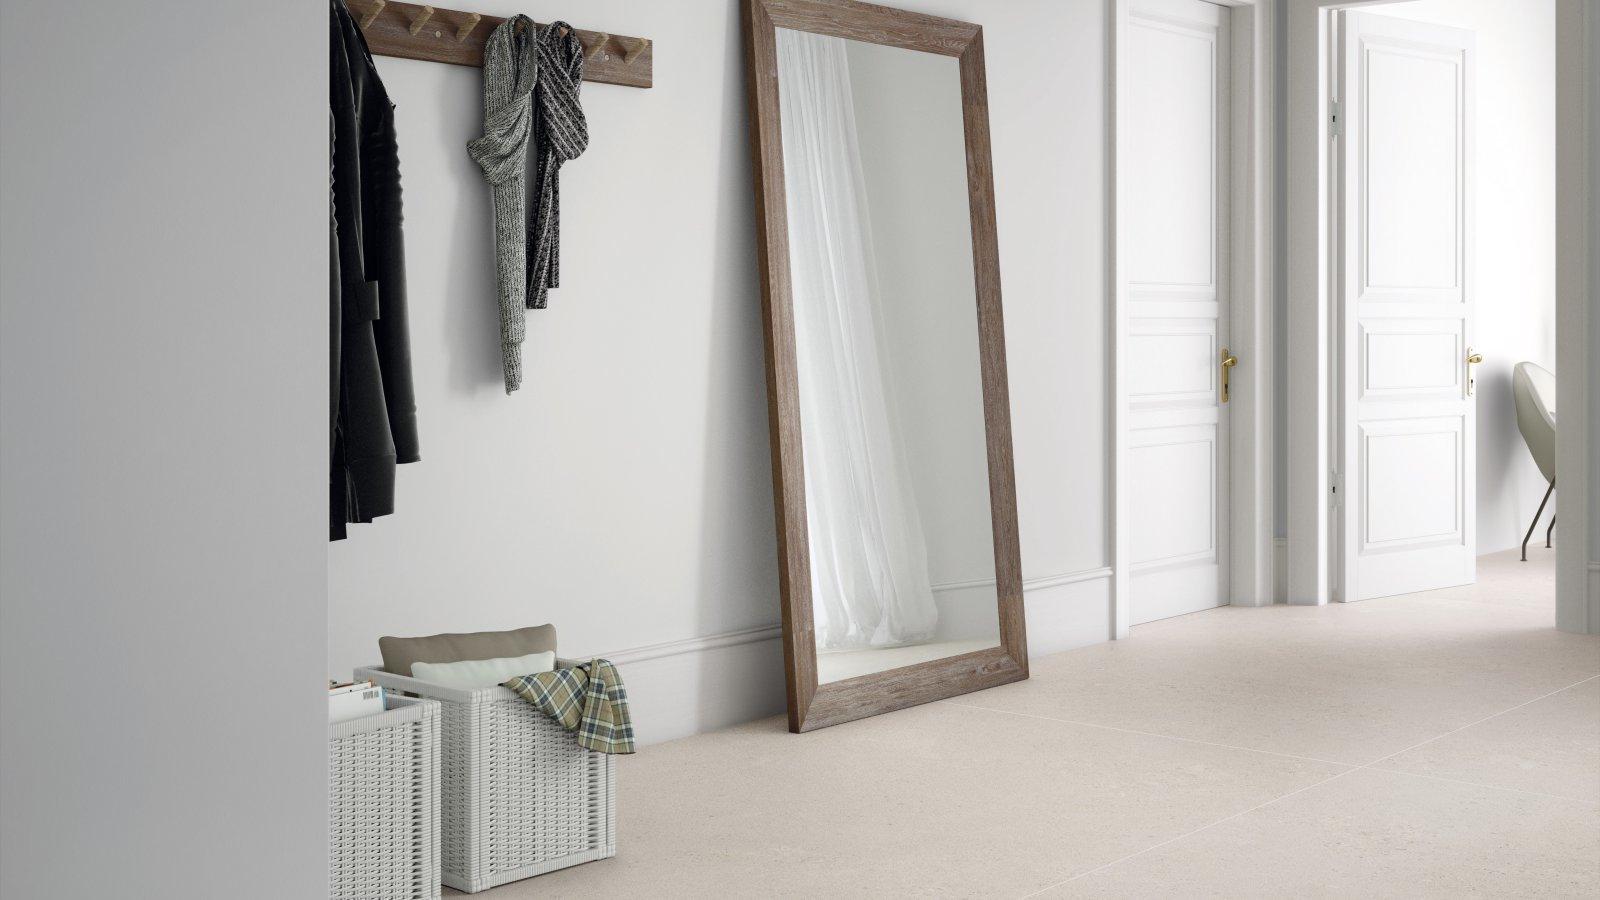 7 Ways Choosing The Right Floor Tiles Can Make A Room Look Bigger